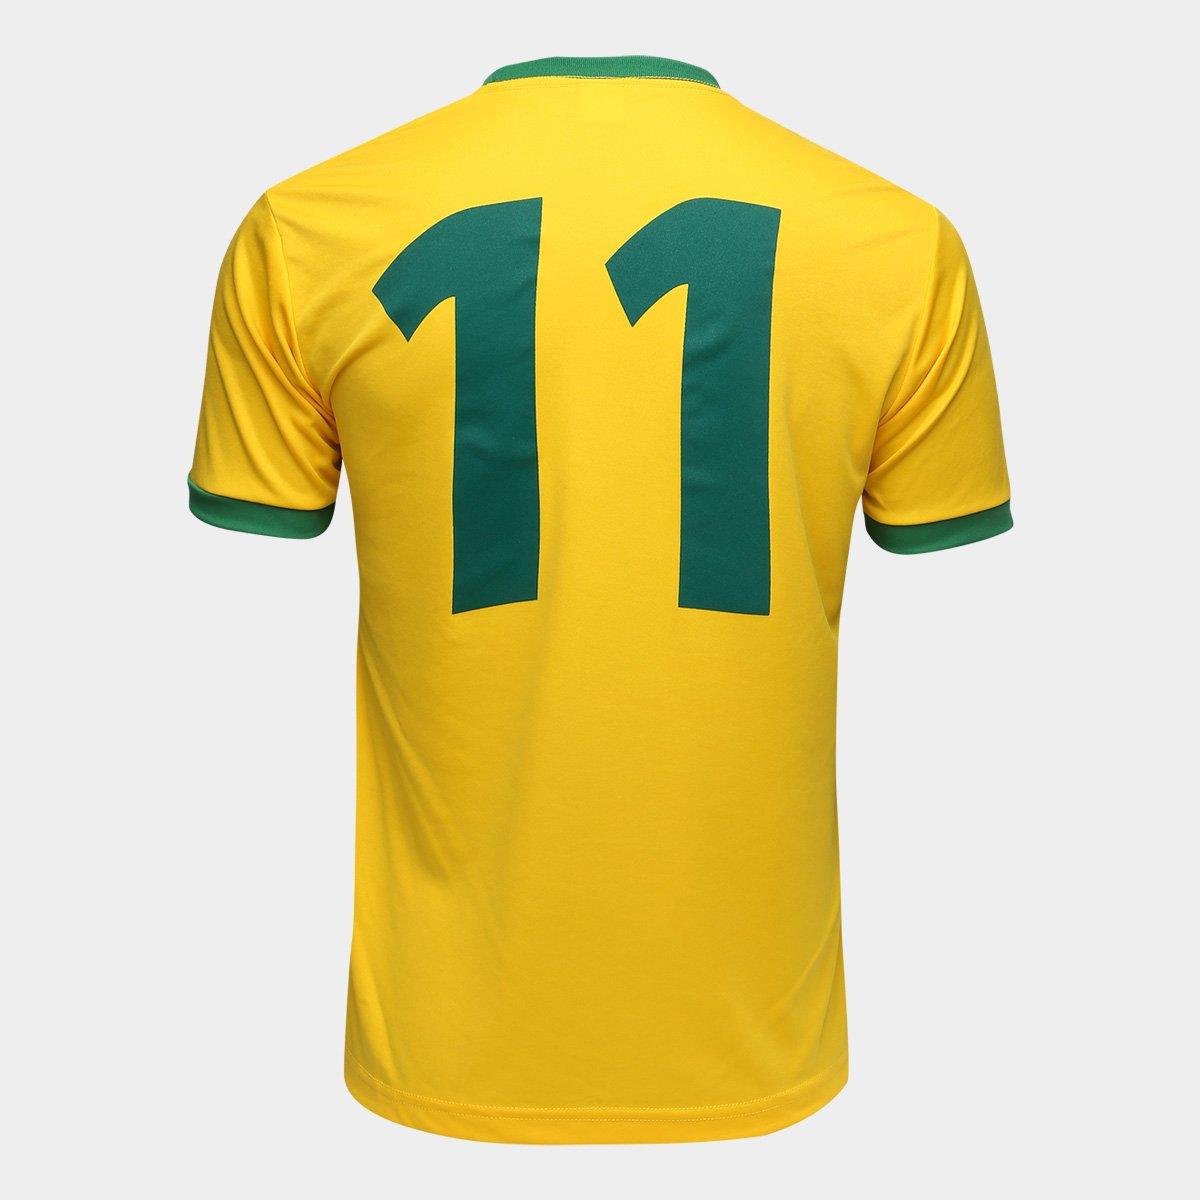 bbfa4251cf Camisa Brasil 1994 n° 11 Lotto Masculina - Amarelo e Verde - Compre ...